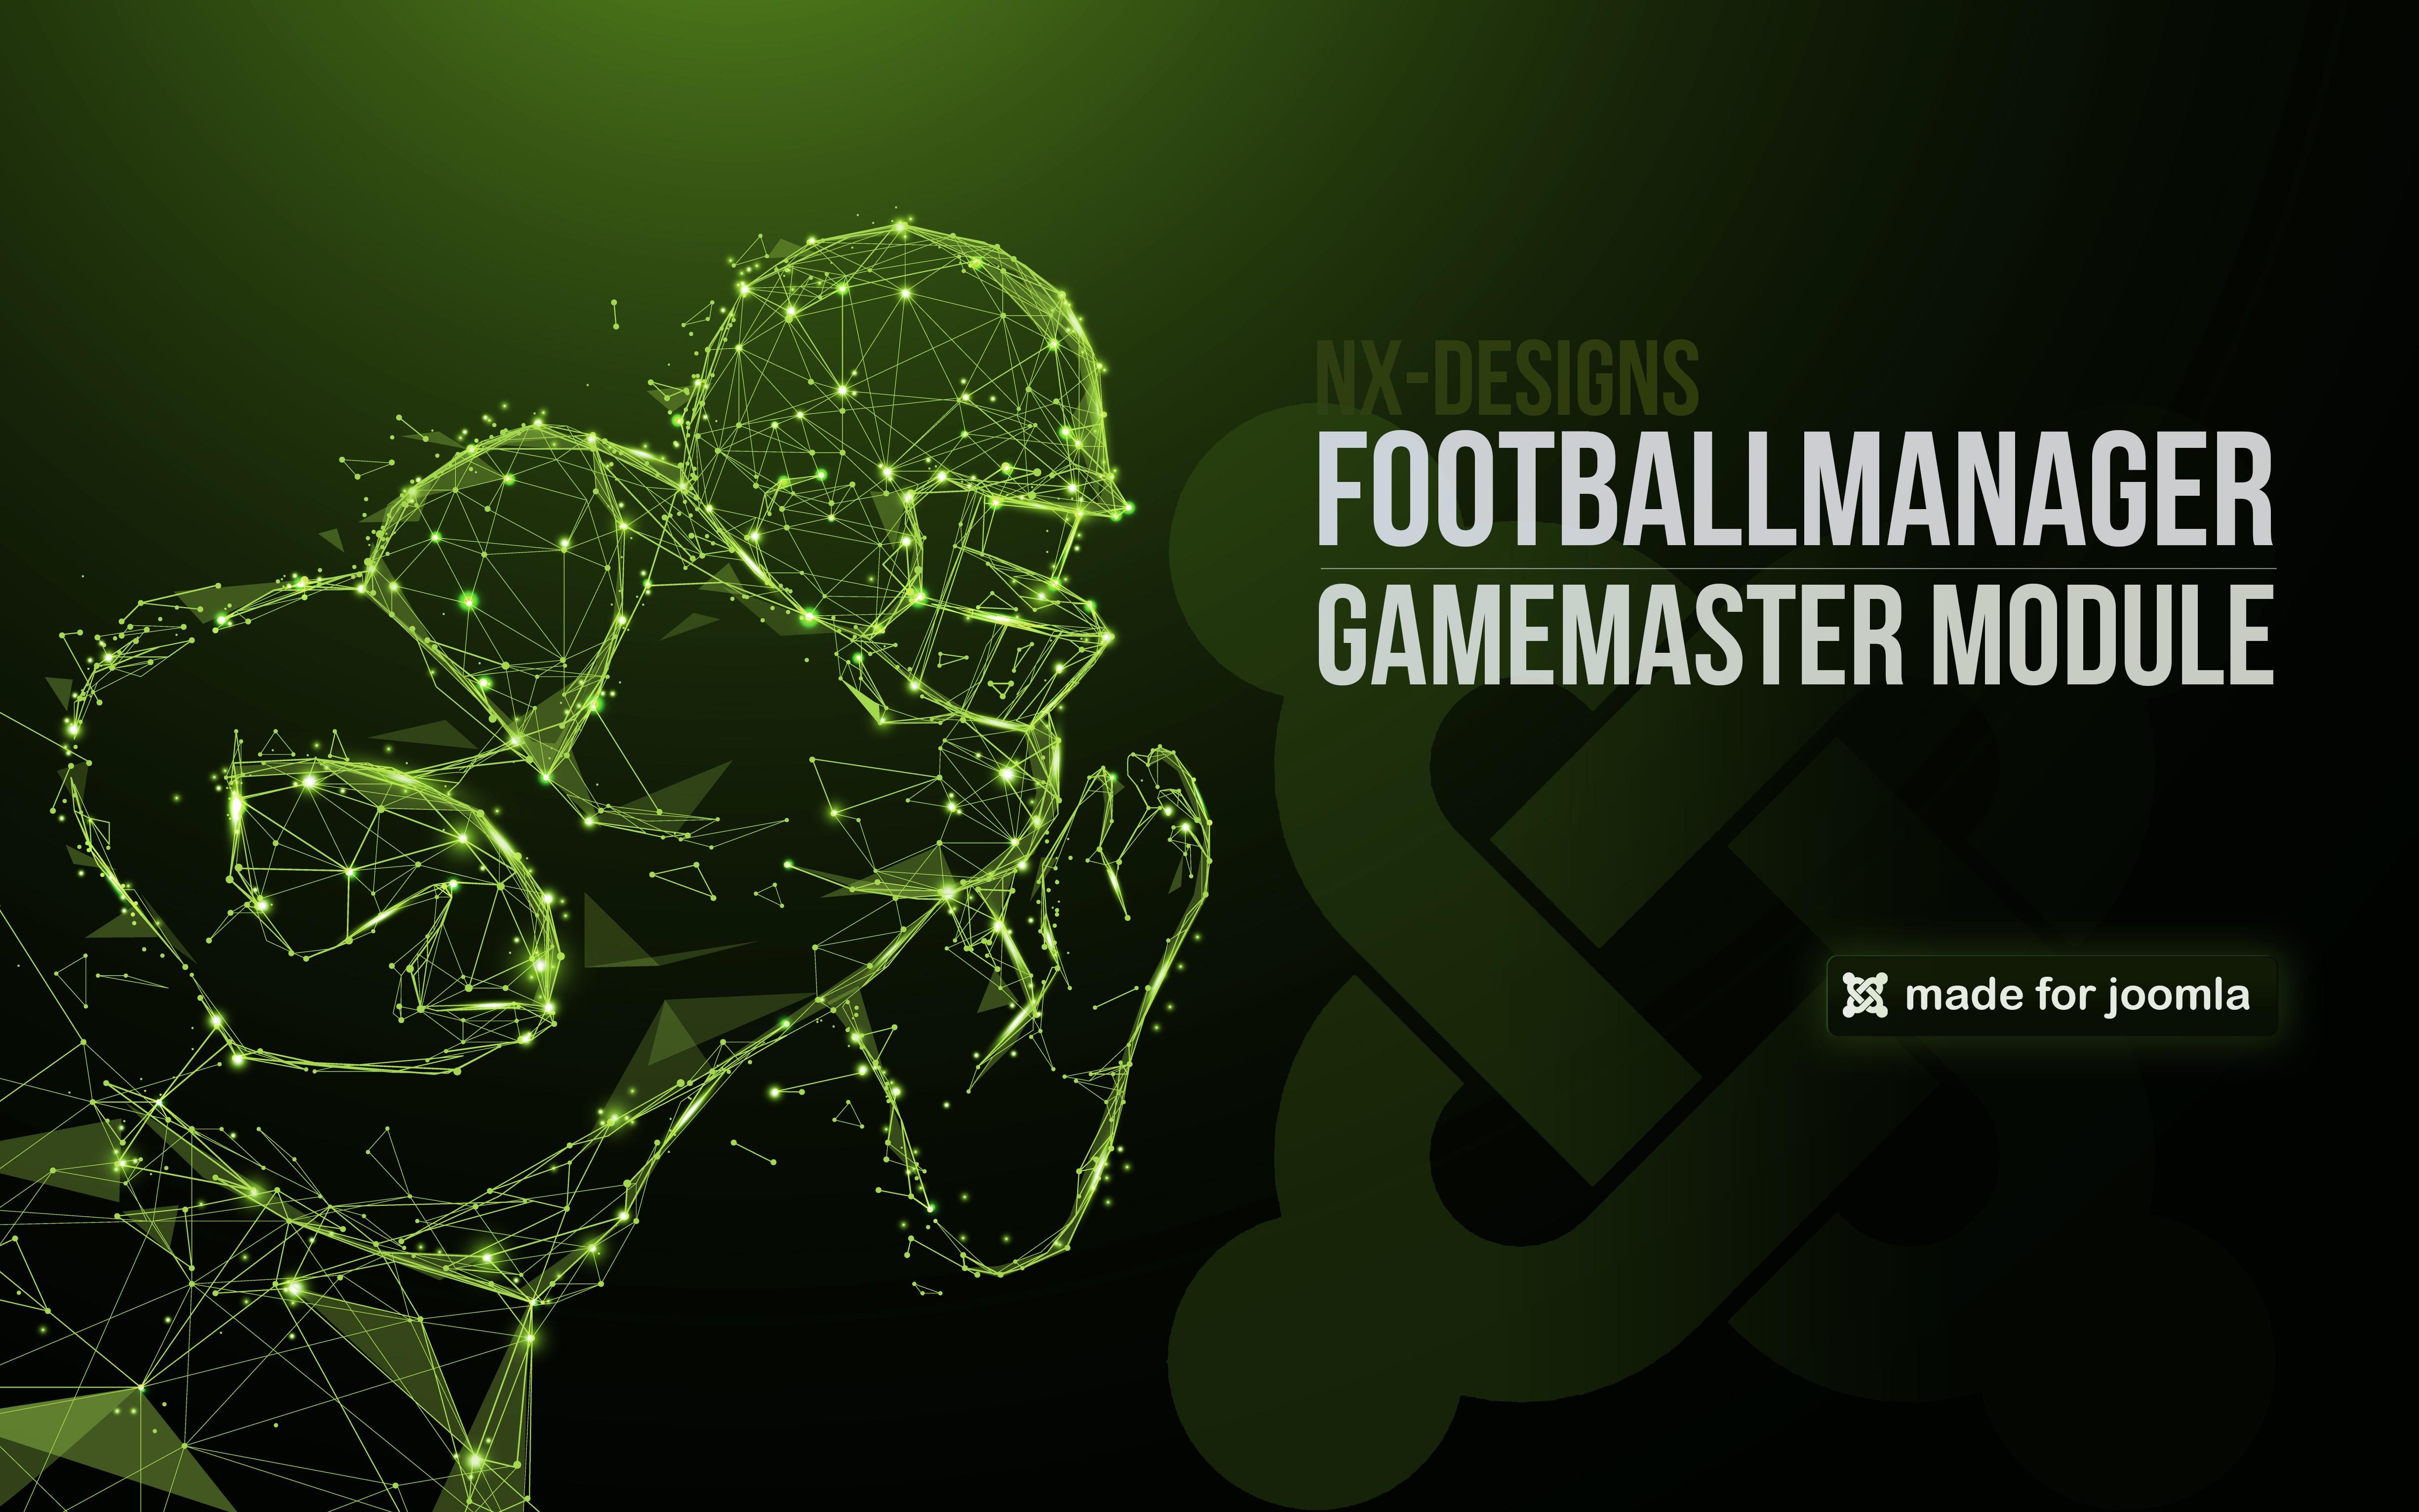 FootballManager GameMaster